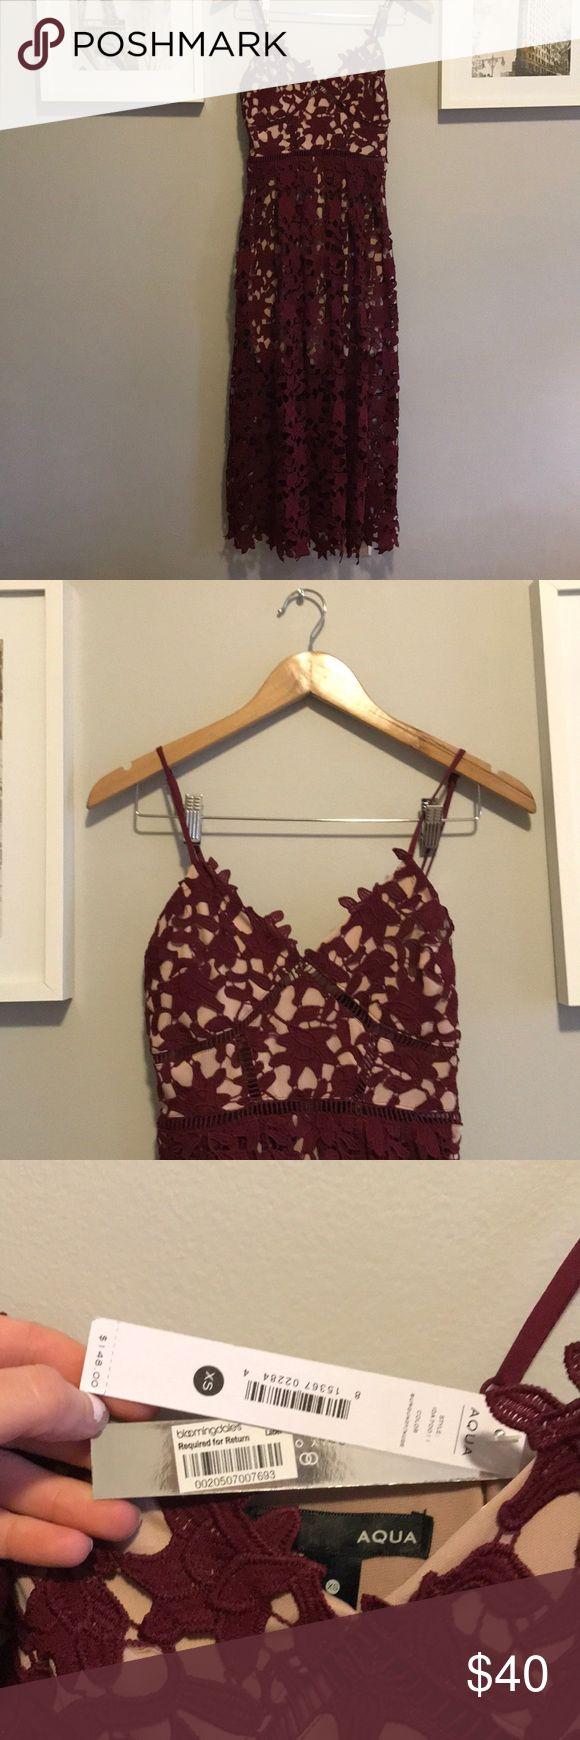 Aqua embroidered dress Beautiful Bloomingdales Aqua dress in maroon! Never worn! Aqua Dresses Midi